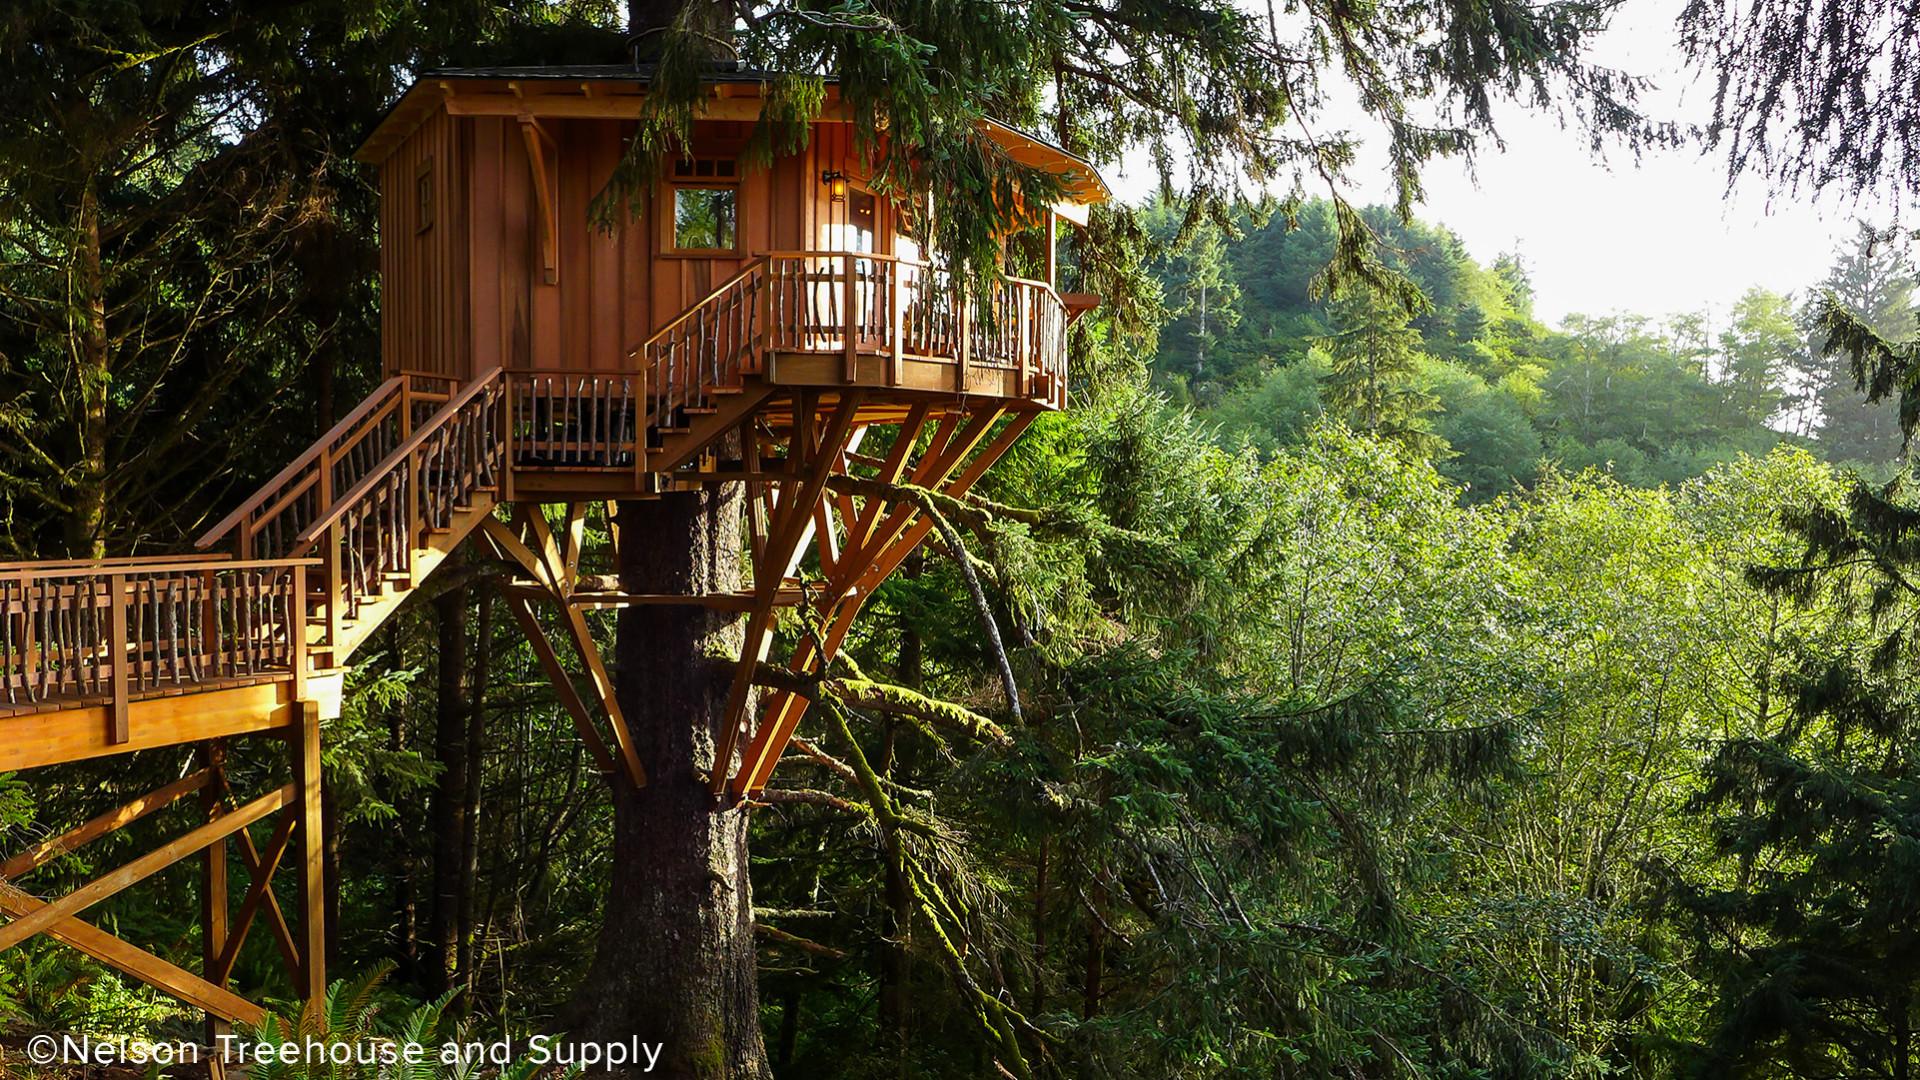 luxurious tree house minecraft nexkowin luxury treehouse supports neskowin swenson say fagt